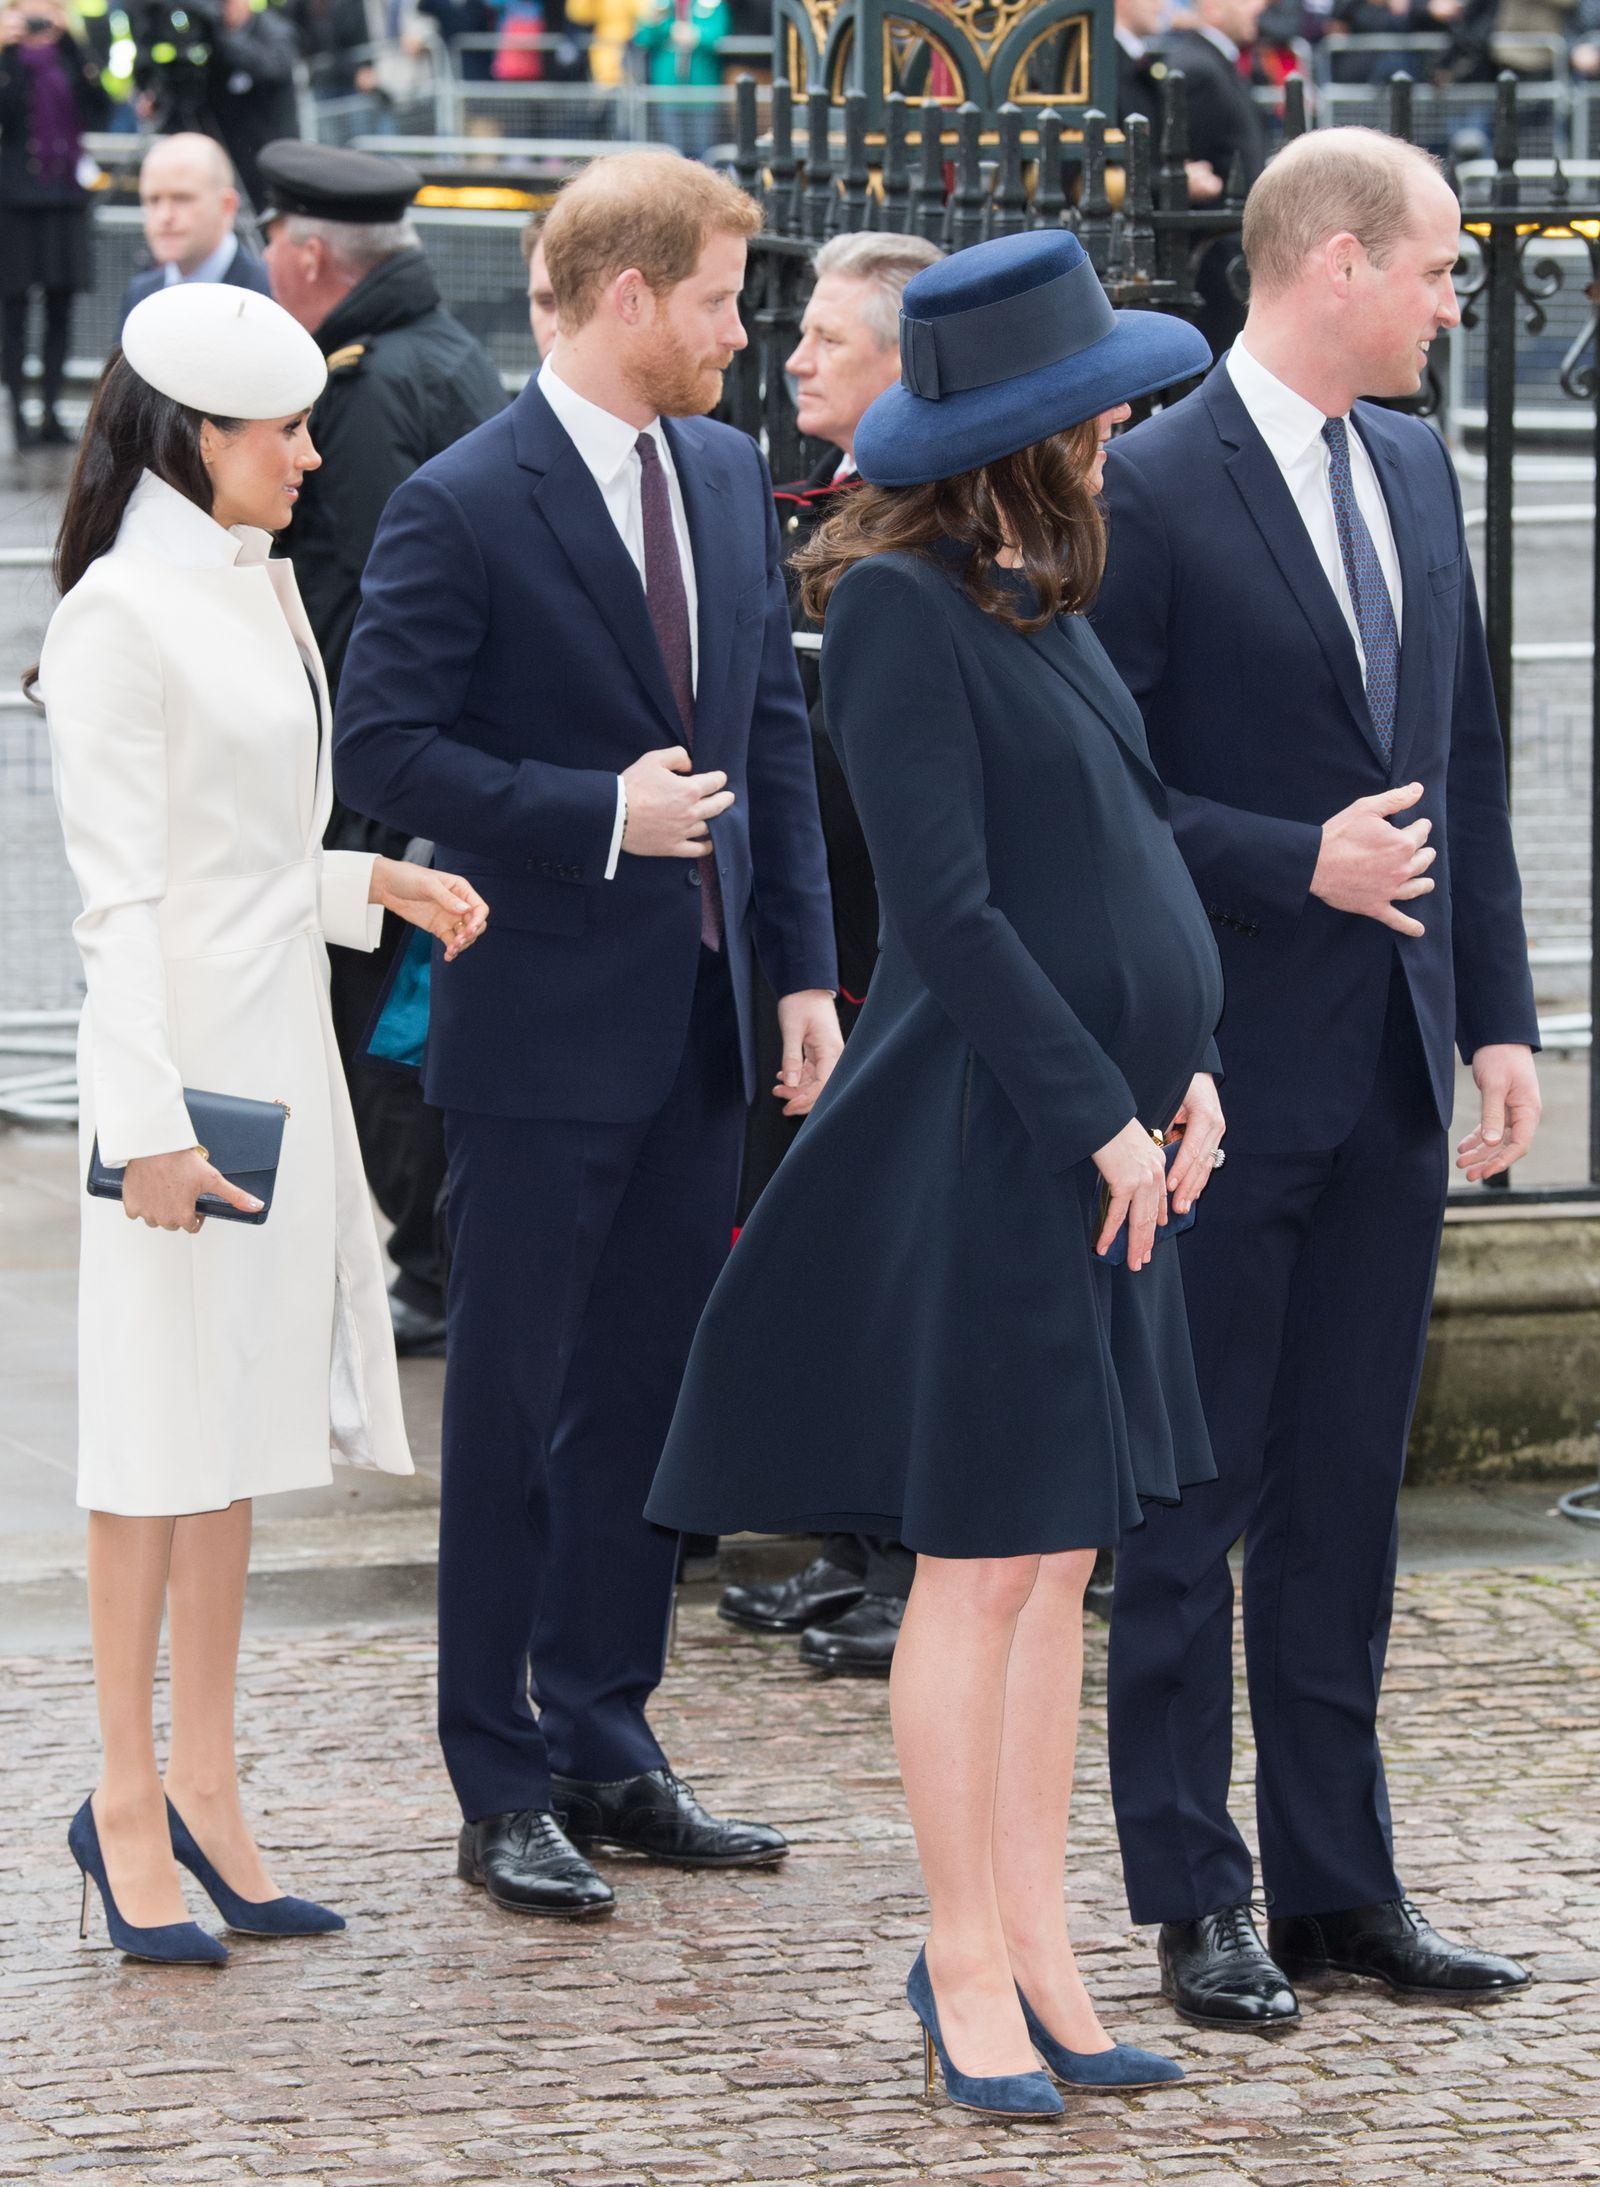 Scarpe Sposa Kate Middleton.Kate Middleton E Meghan Markle Con Le Stesse Scarpe Come Gemelline